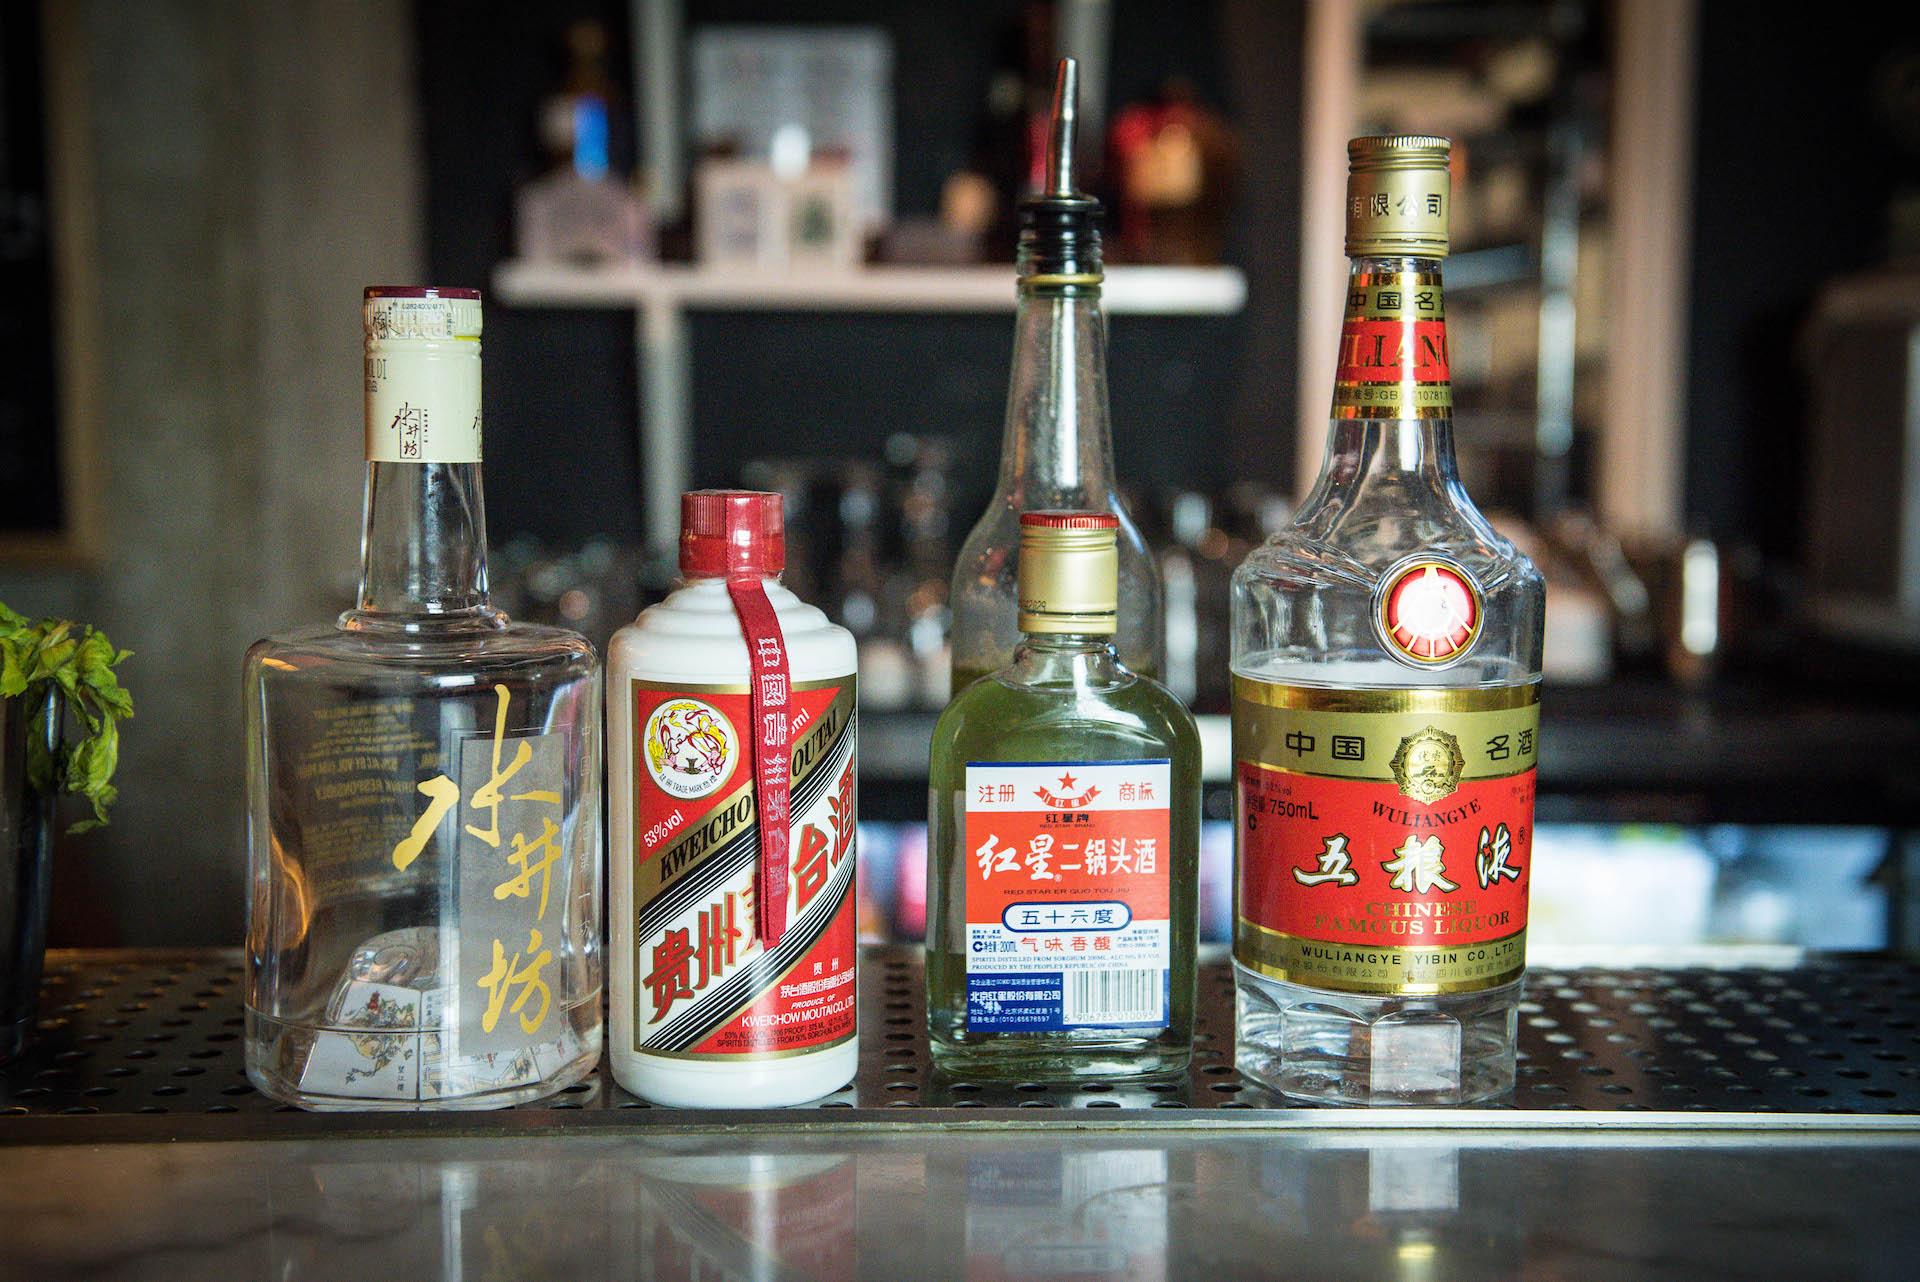 The different varieties of baijiu served at Peking Tavern.